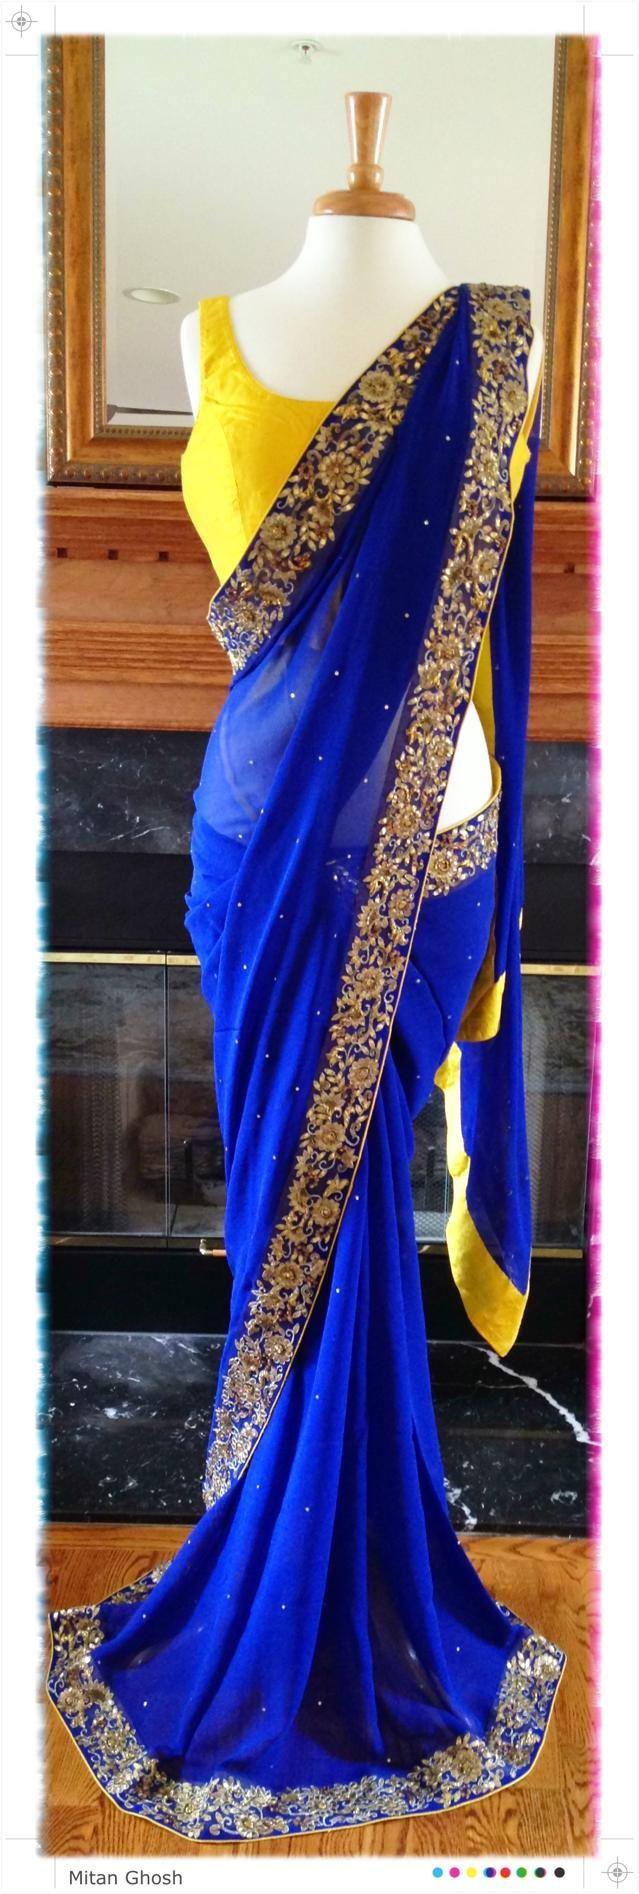 Gota patti with dabka work on a georgette saree by http://www.MitanGhosh.com/ ~ http://pinterest.com/mitanghosh/pins/ New Jersey